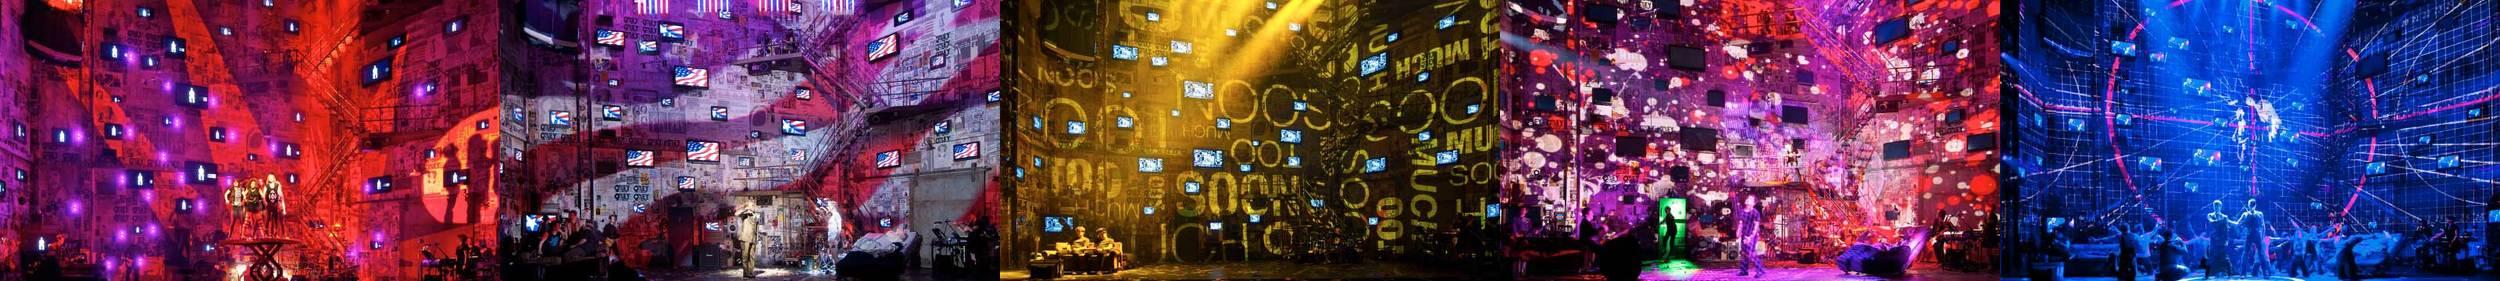 """American Idiot"" St. James Theatre, Broadway"